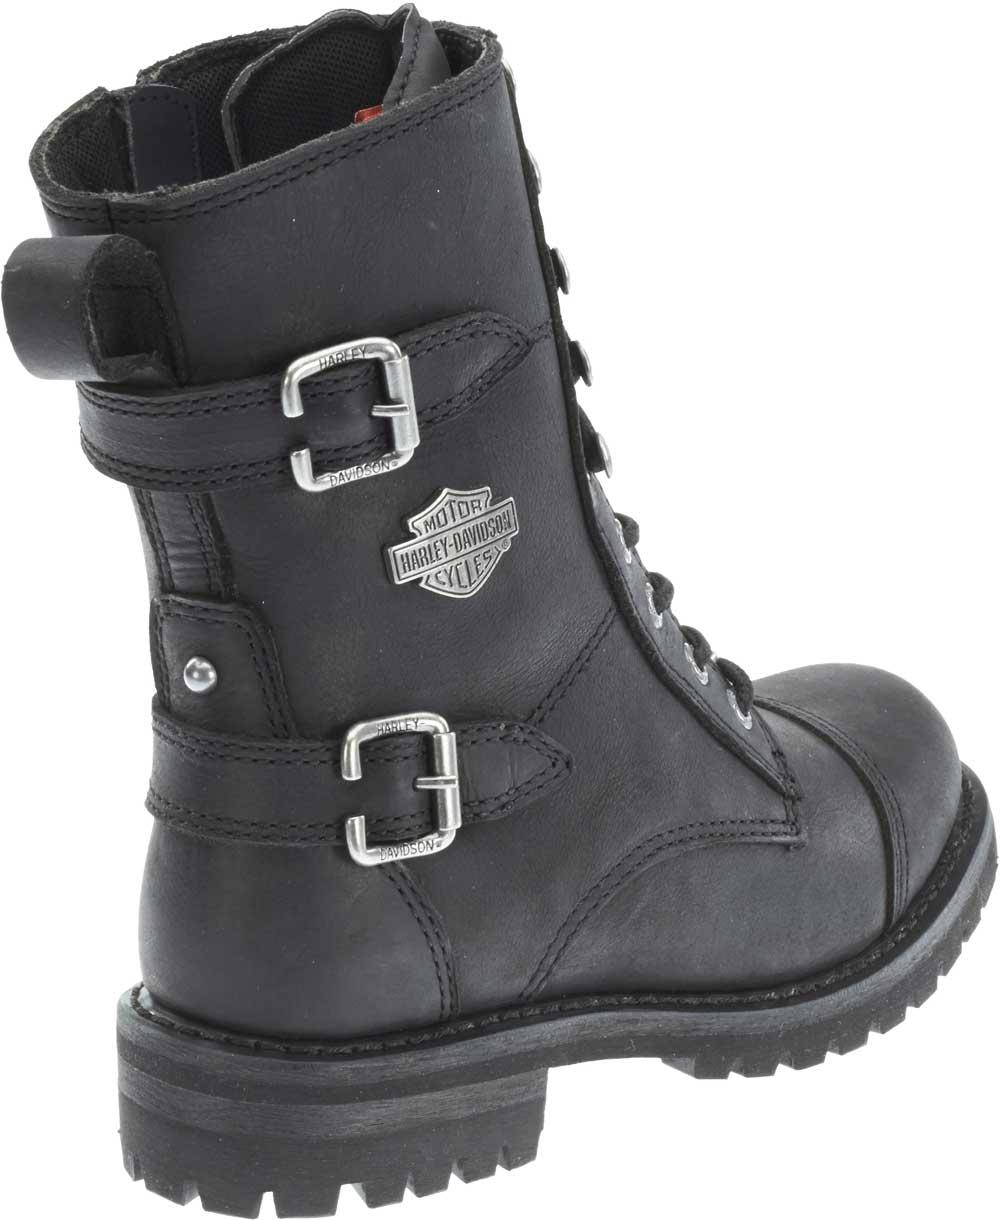 "Harley-Davidson Women's Balsa 7"" Motorcycle Boots. Blk ..."